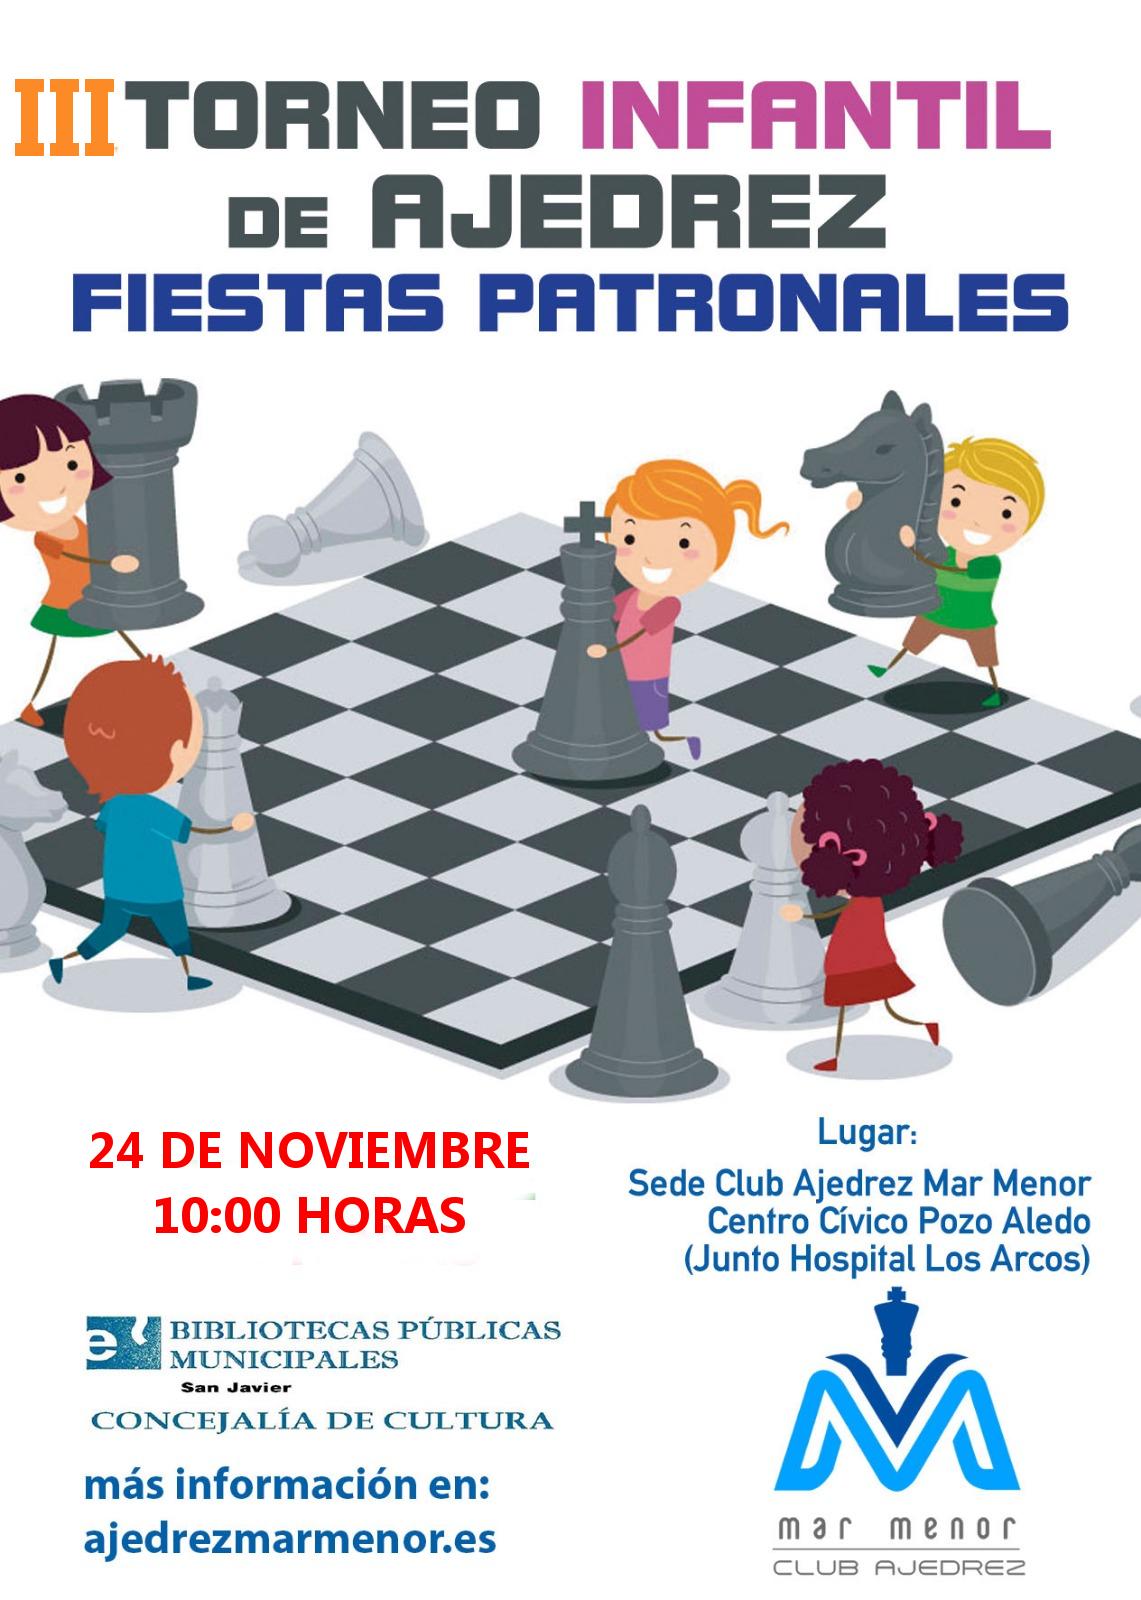 III Torneo Infantil Fiestas Patronales